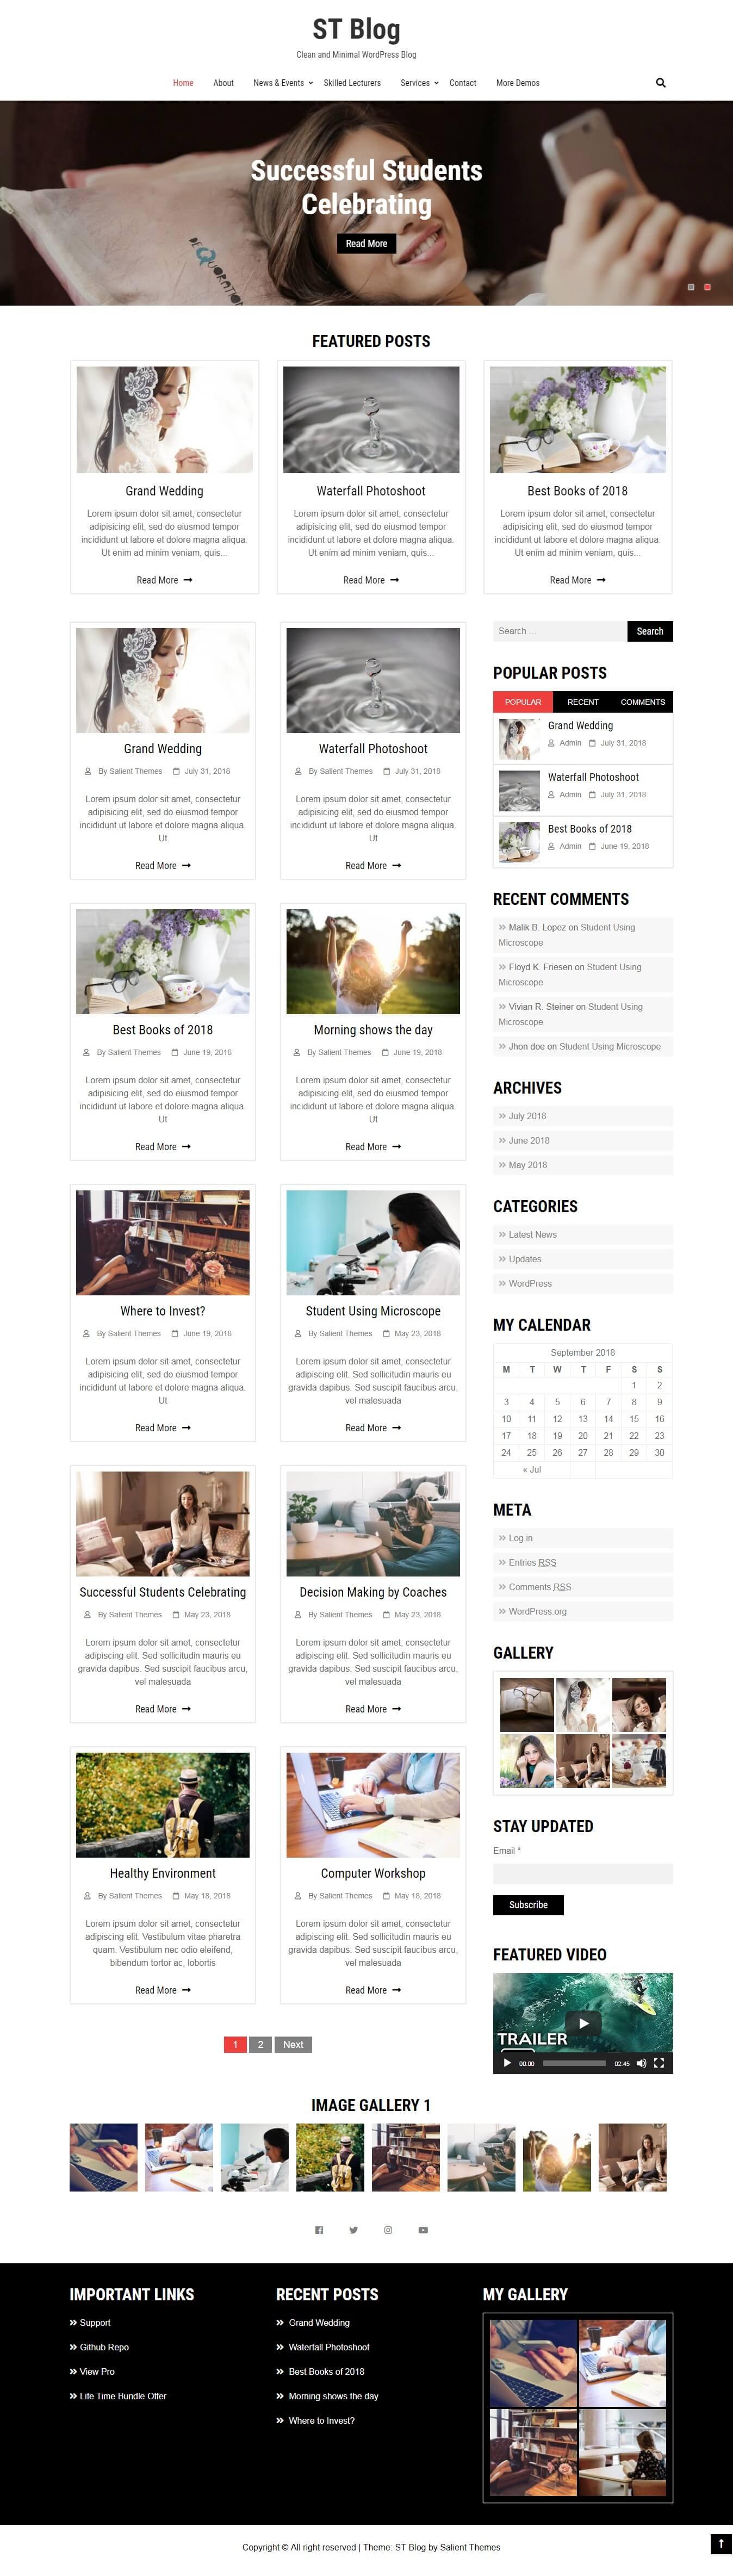 ST Blog